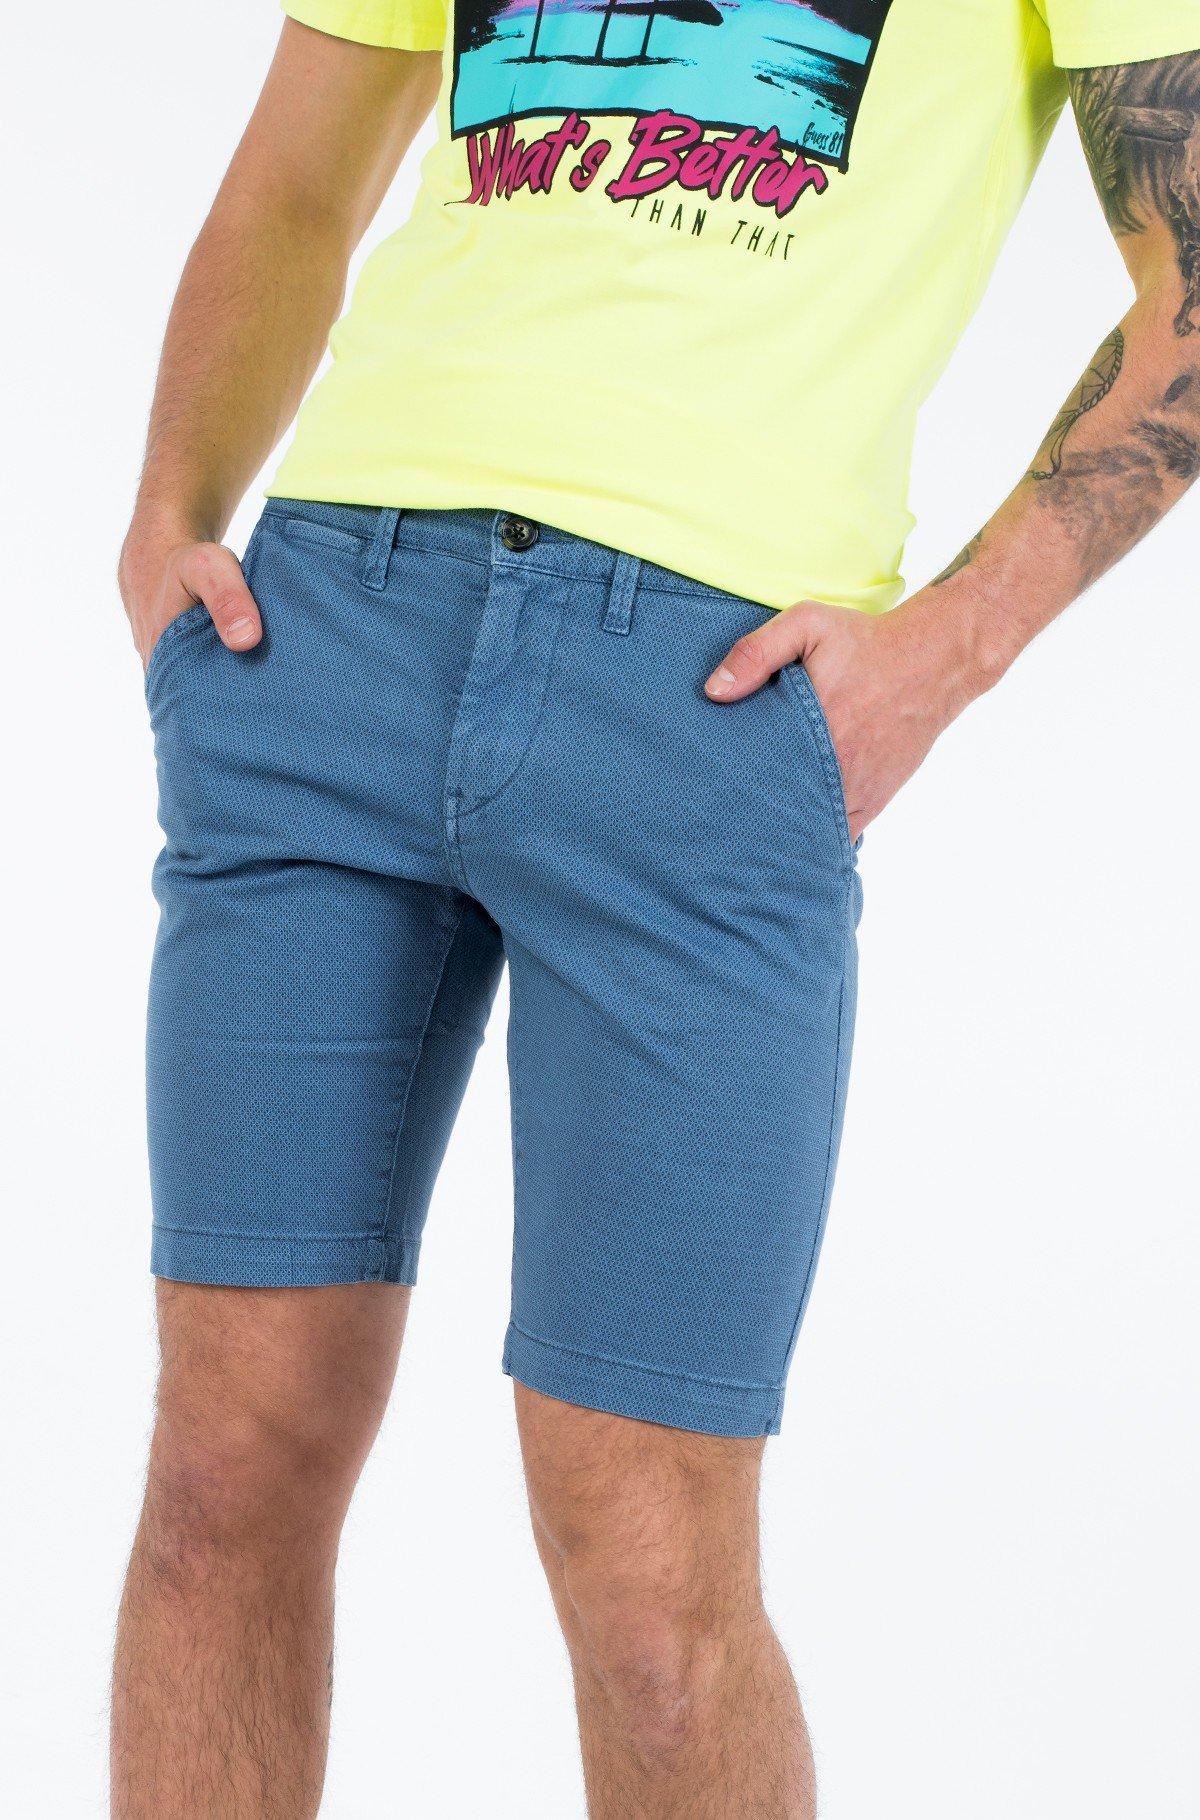 Shorts CHARLY SHORT MINIMAL/PM800773-full-1